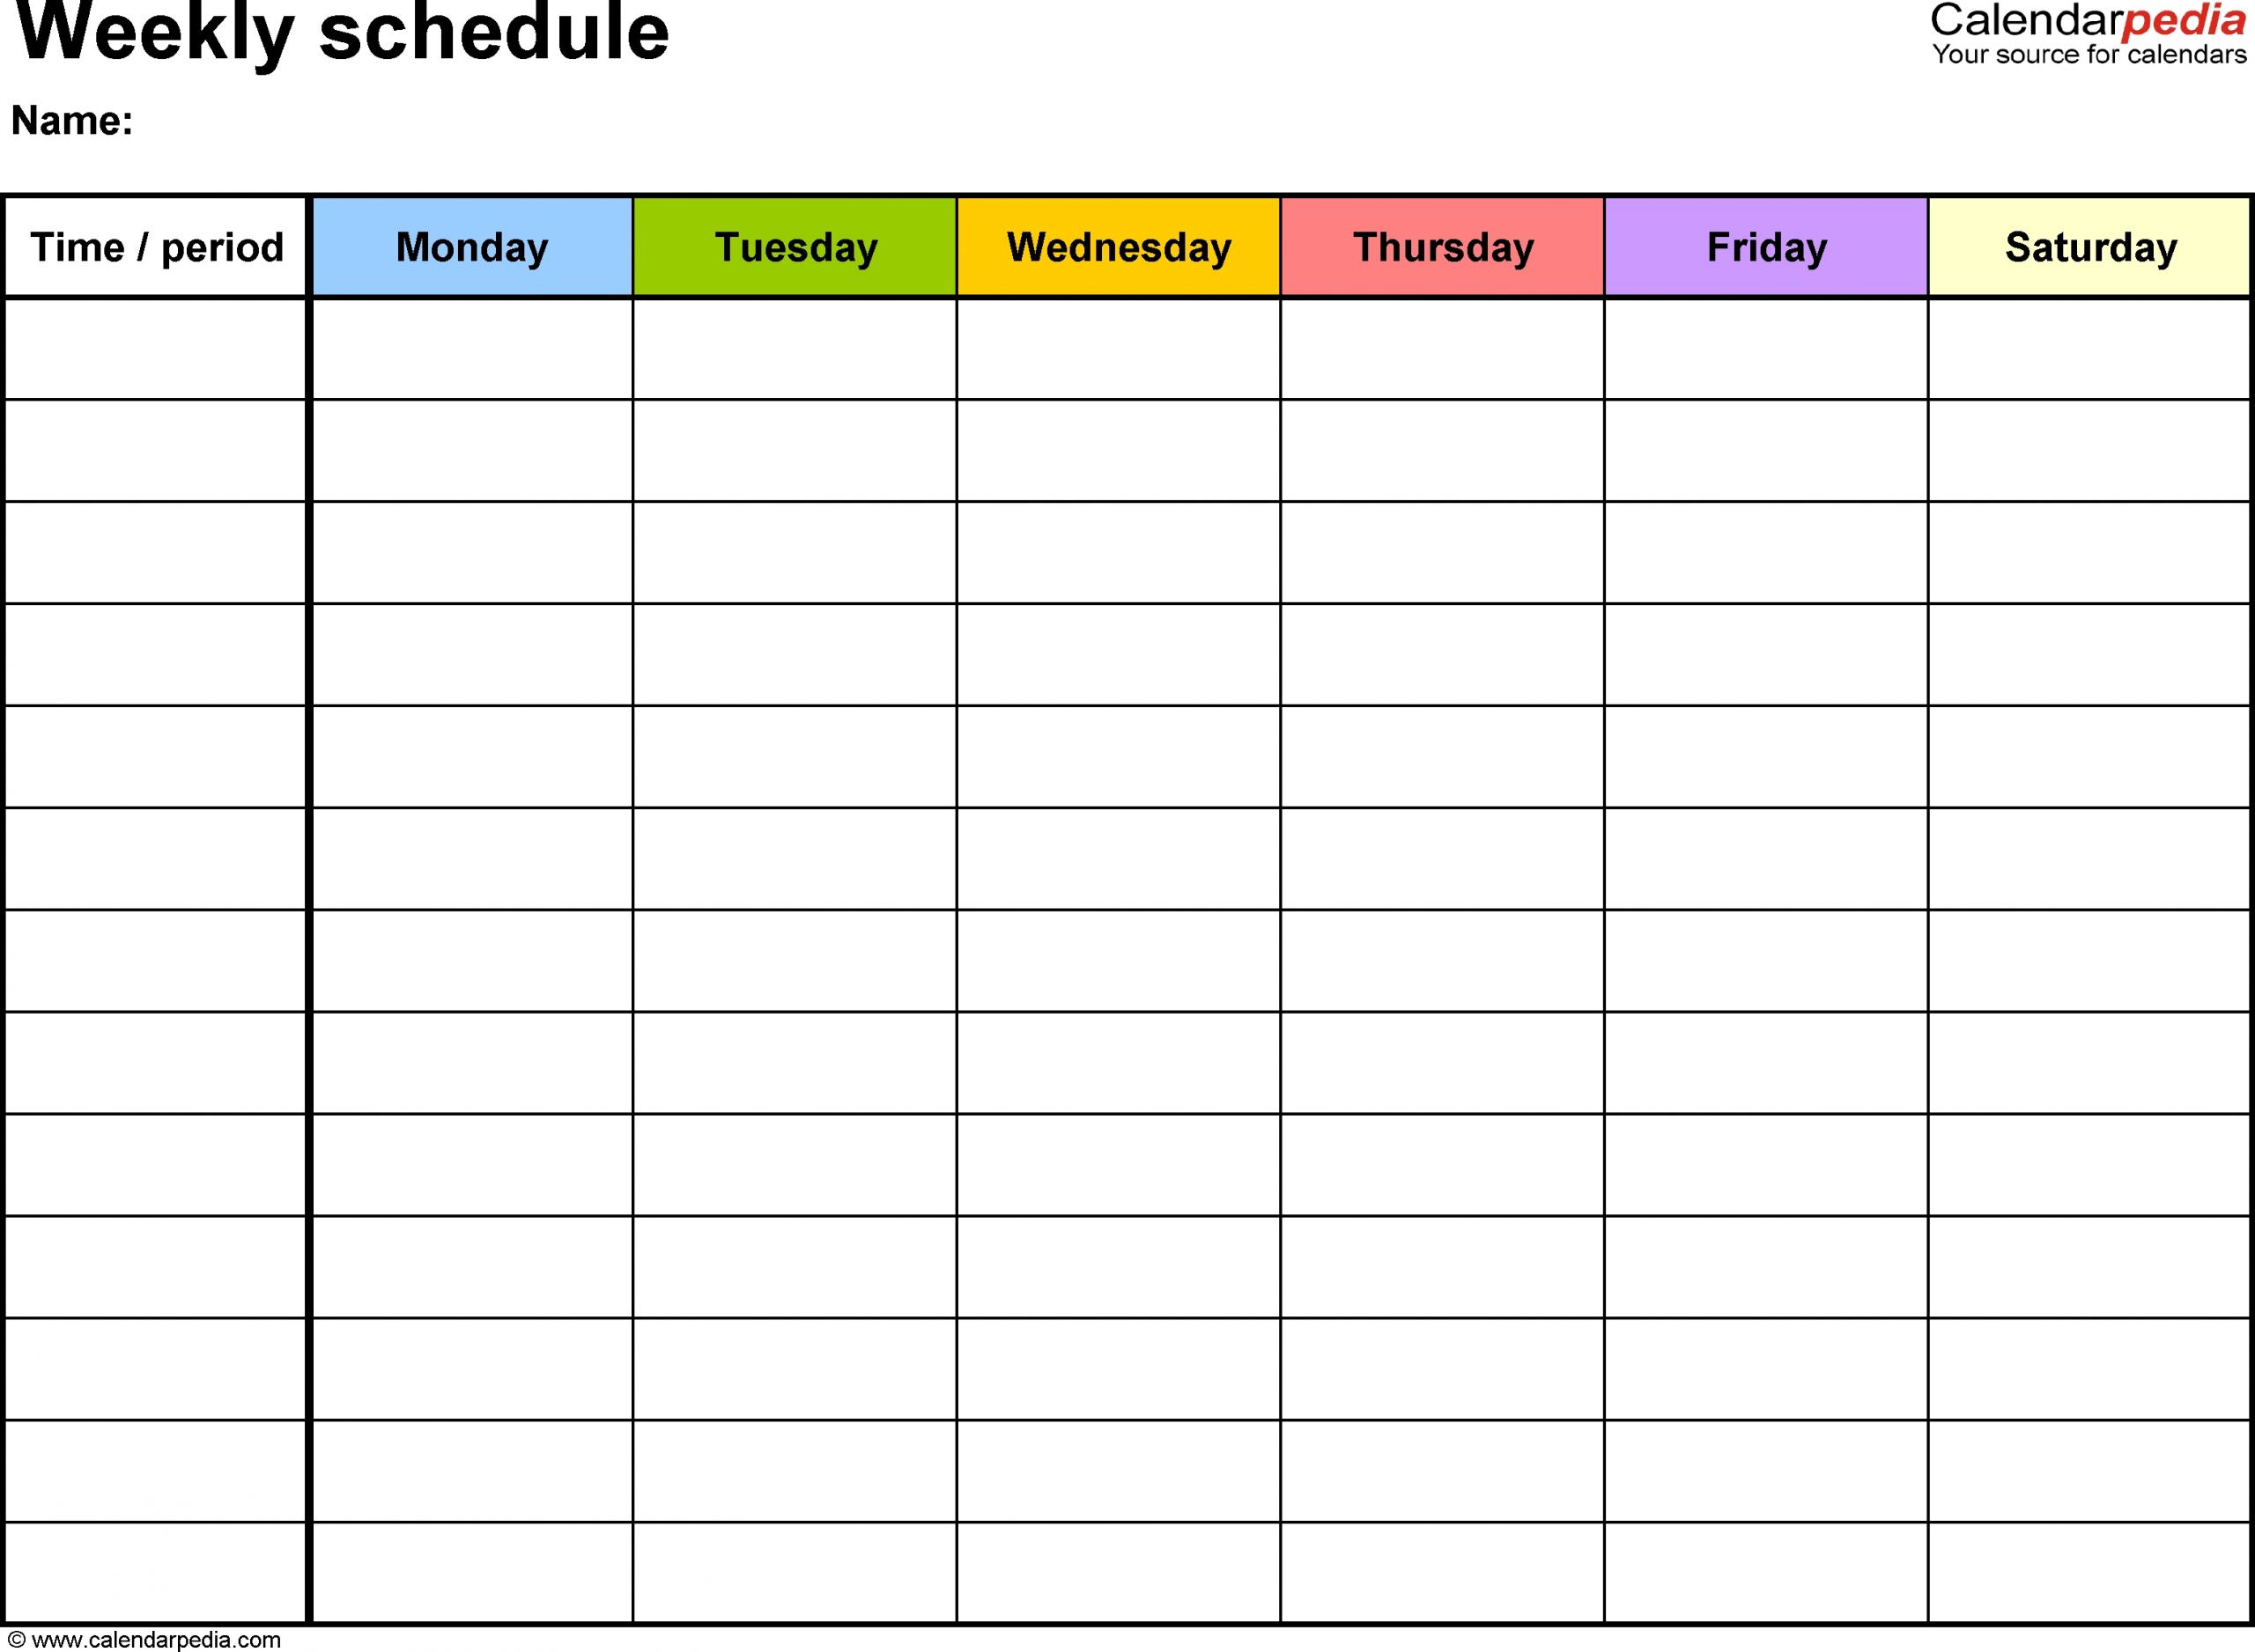 One Week Calendar Template With Hours Calendar